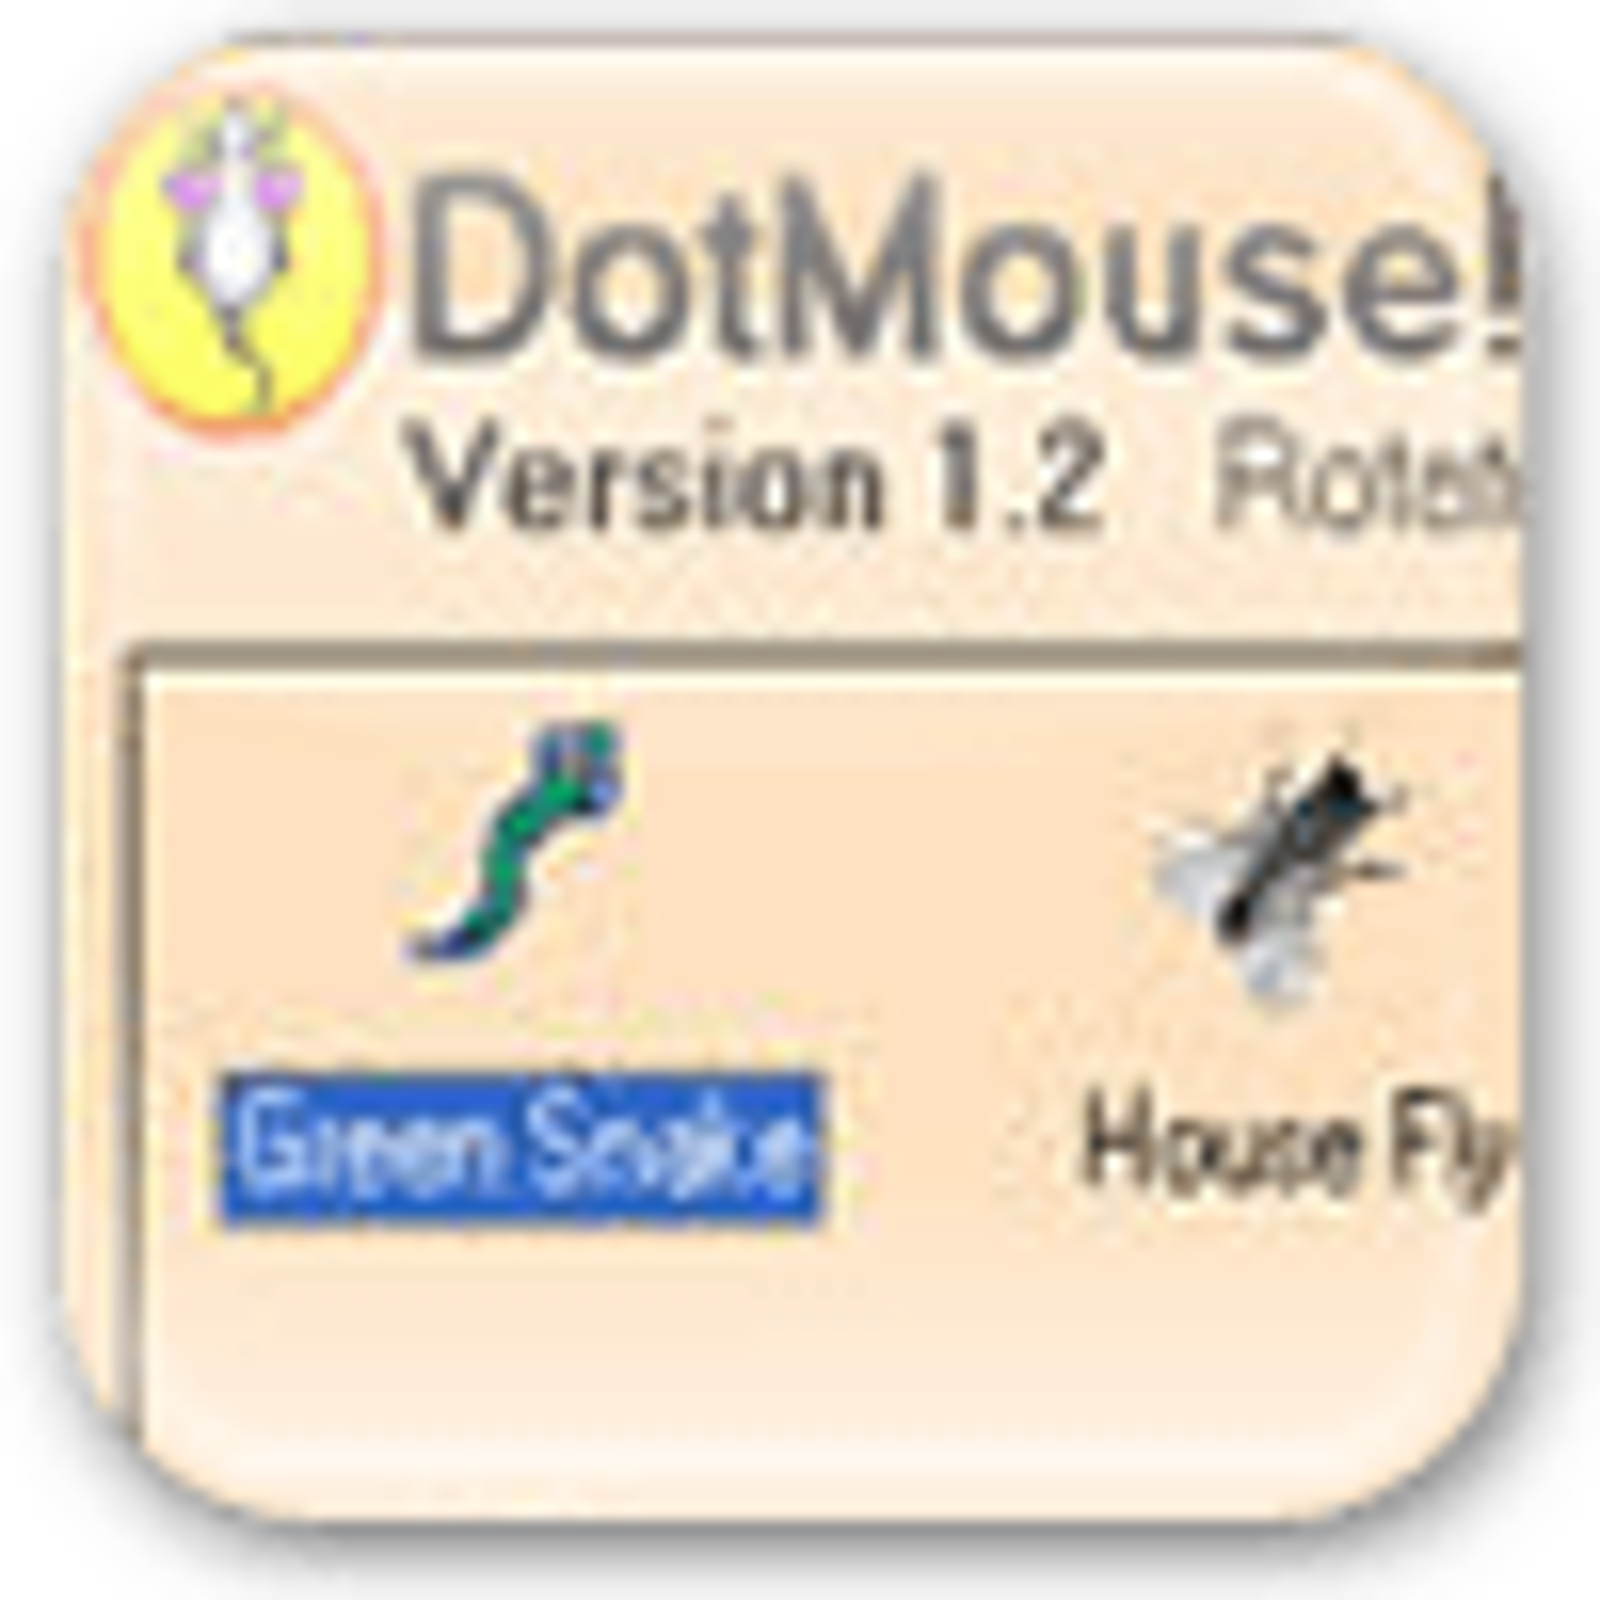 DotMouse